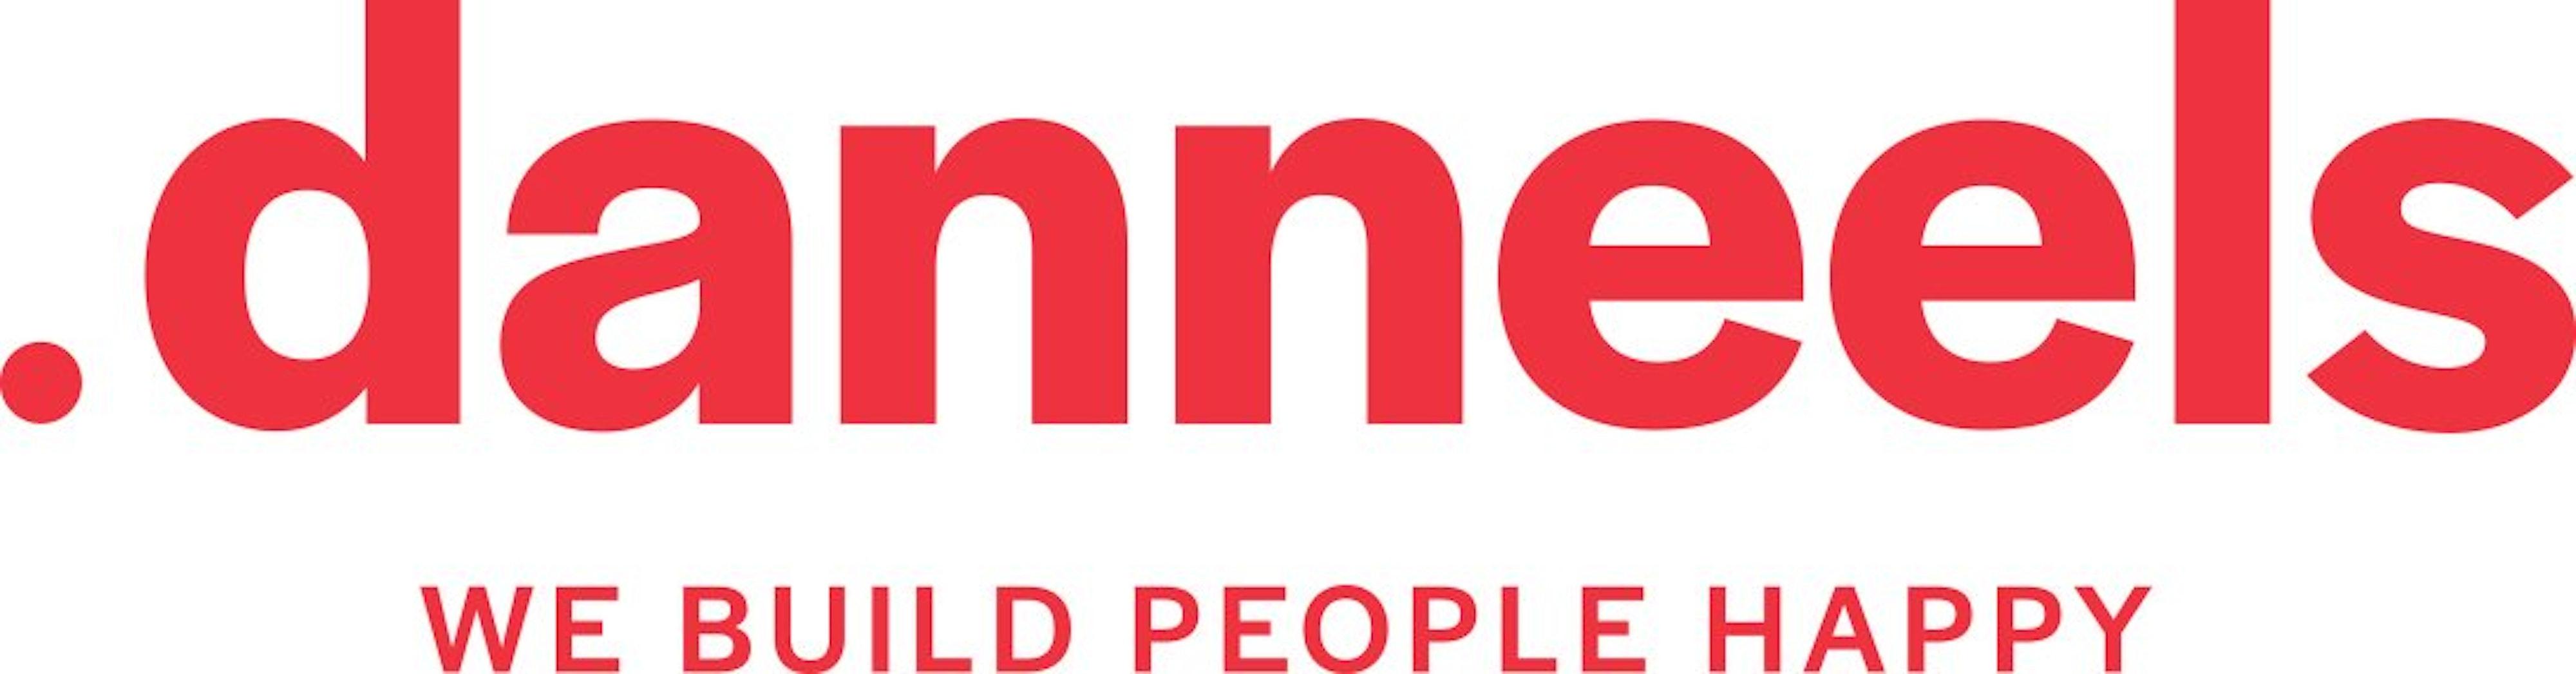 Danneels logo